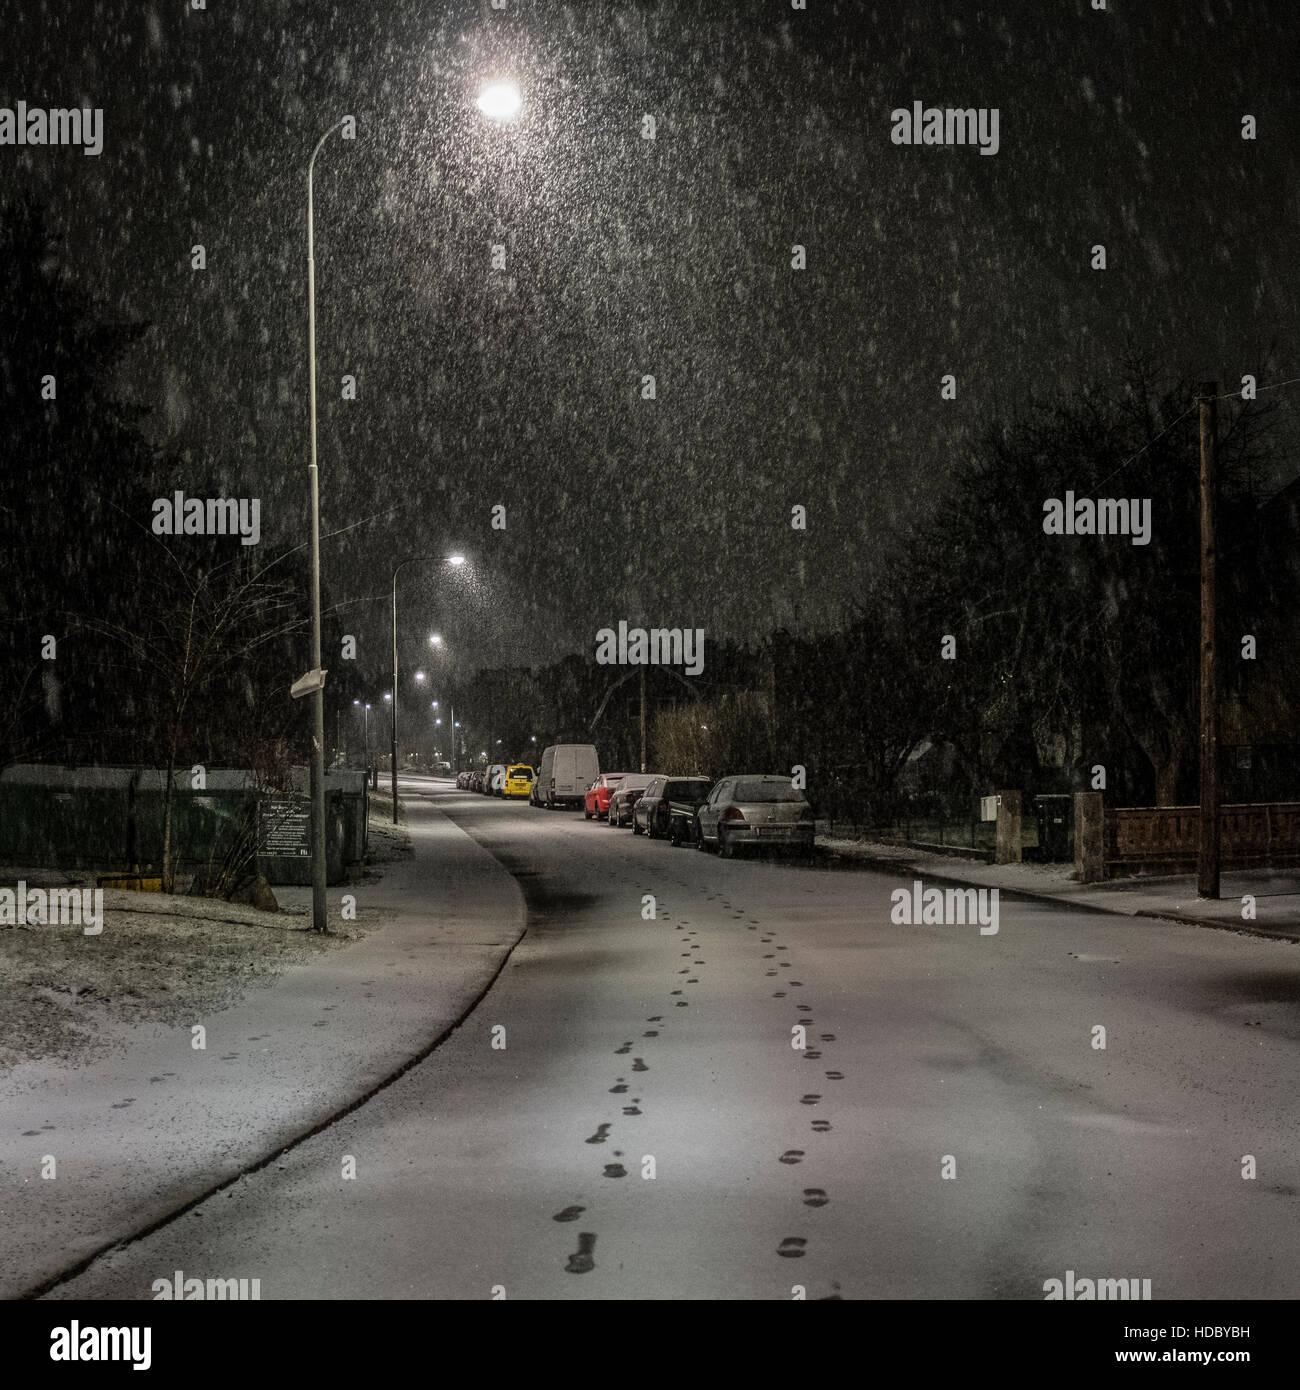 Tracks in the winter night / Spår i vinternatten - Stock Image